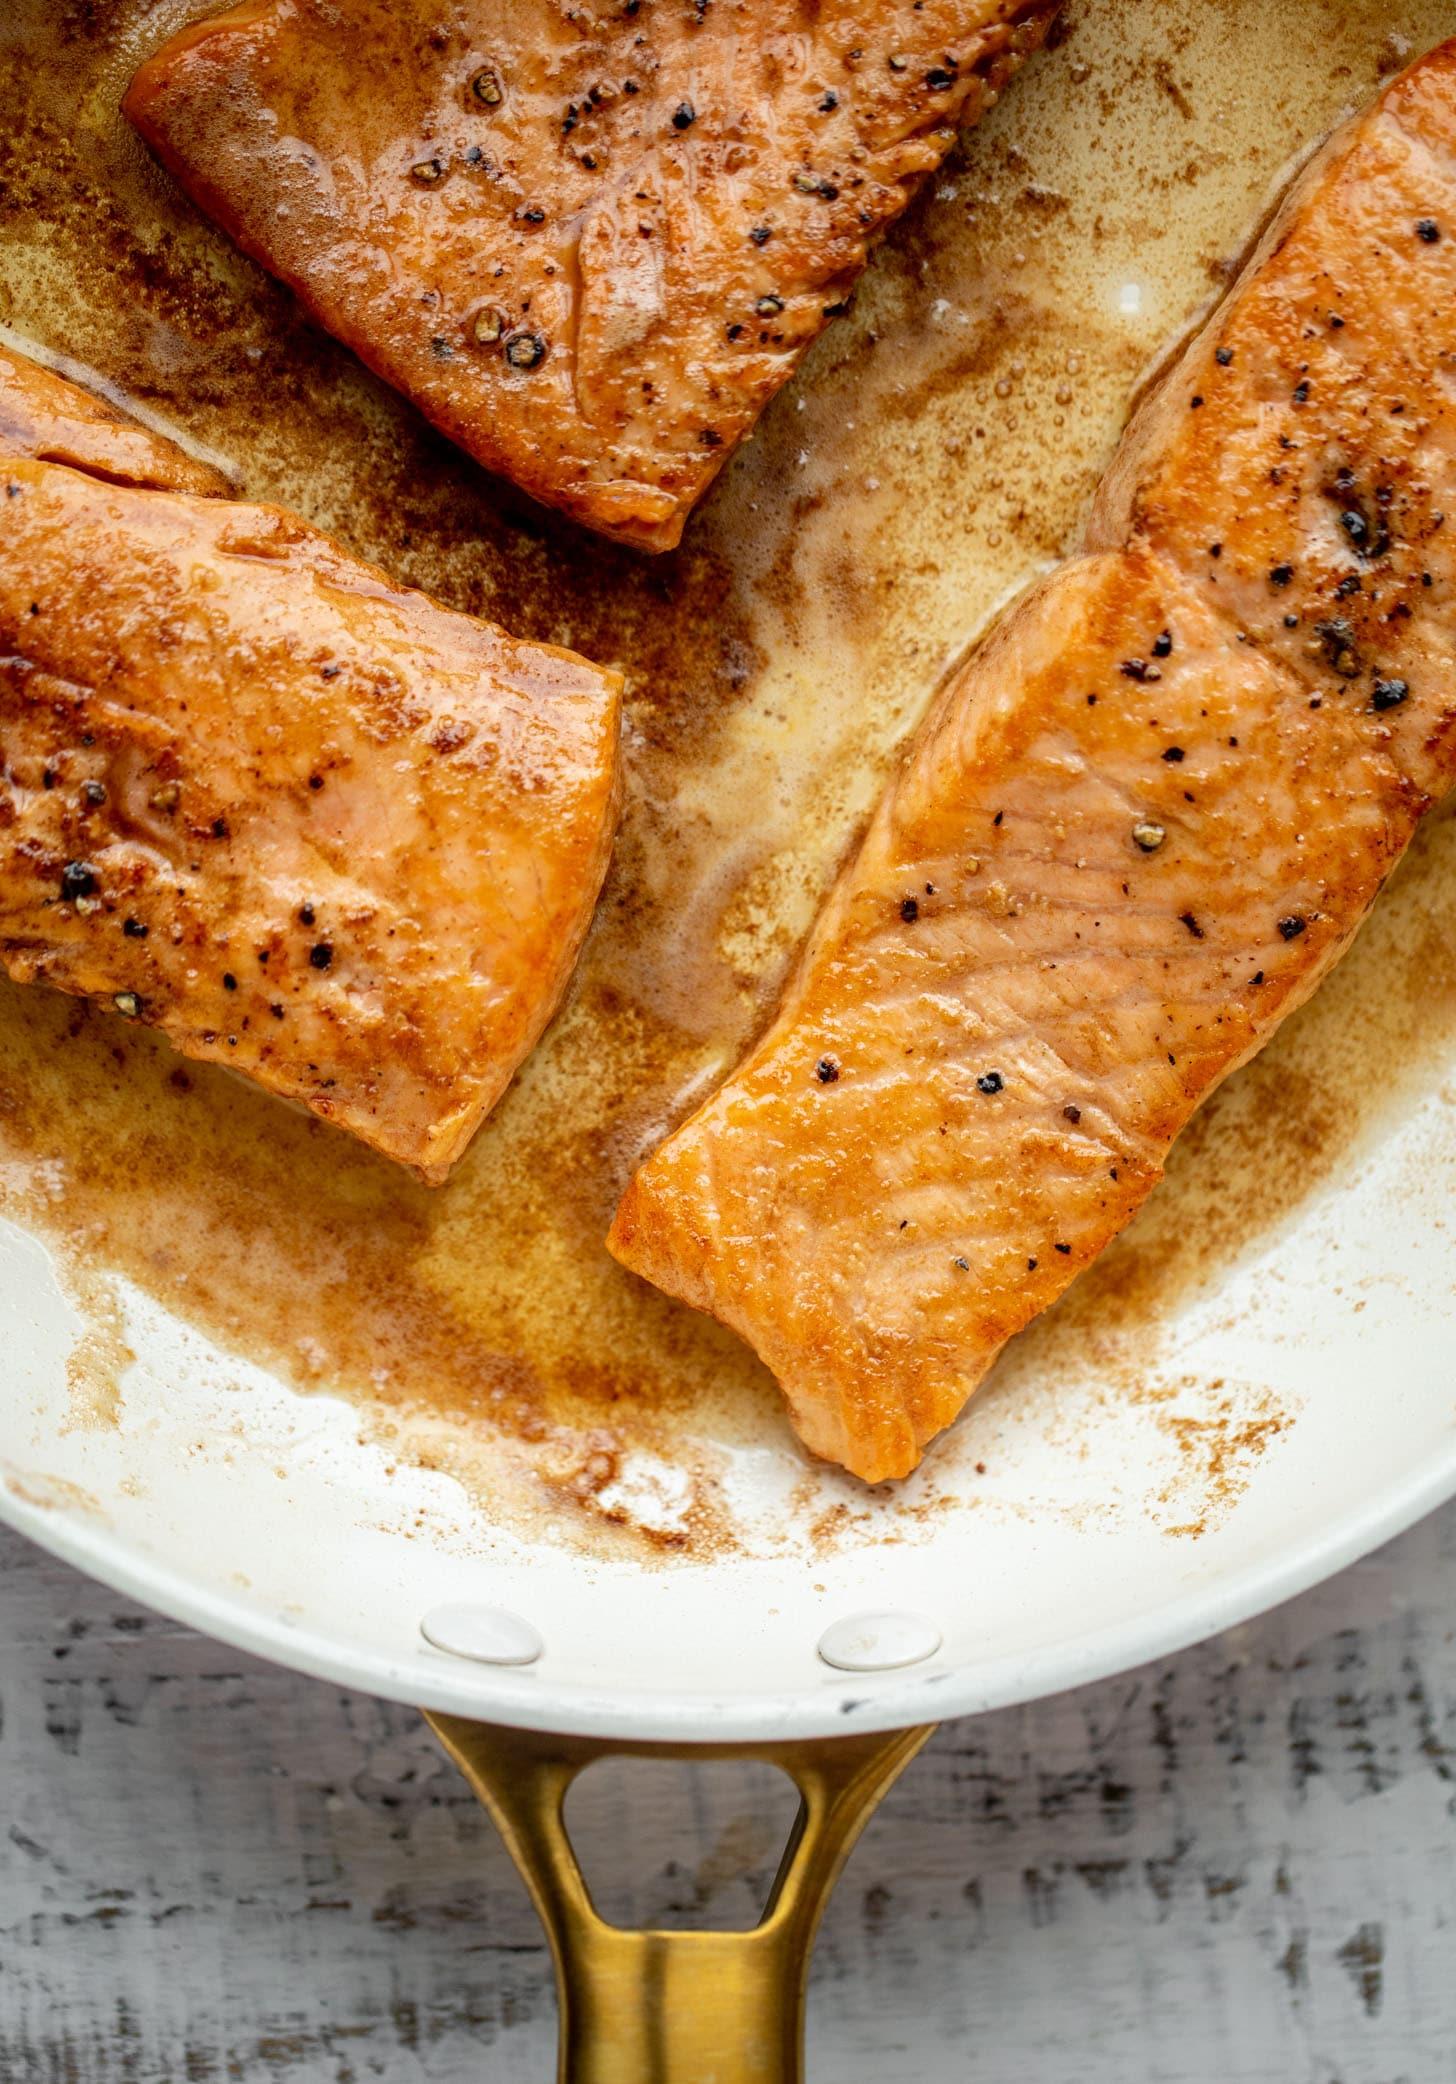 salmón cocido en mantequilla morena